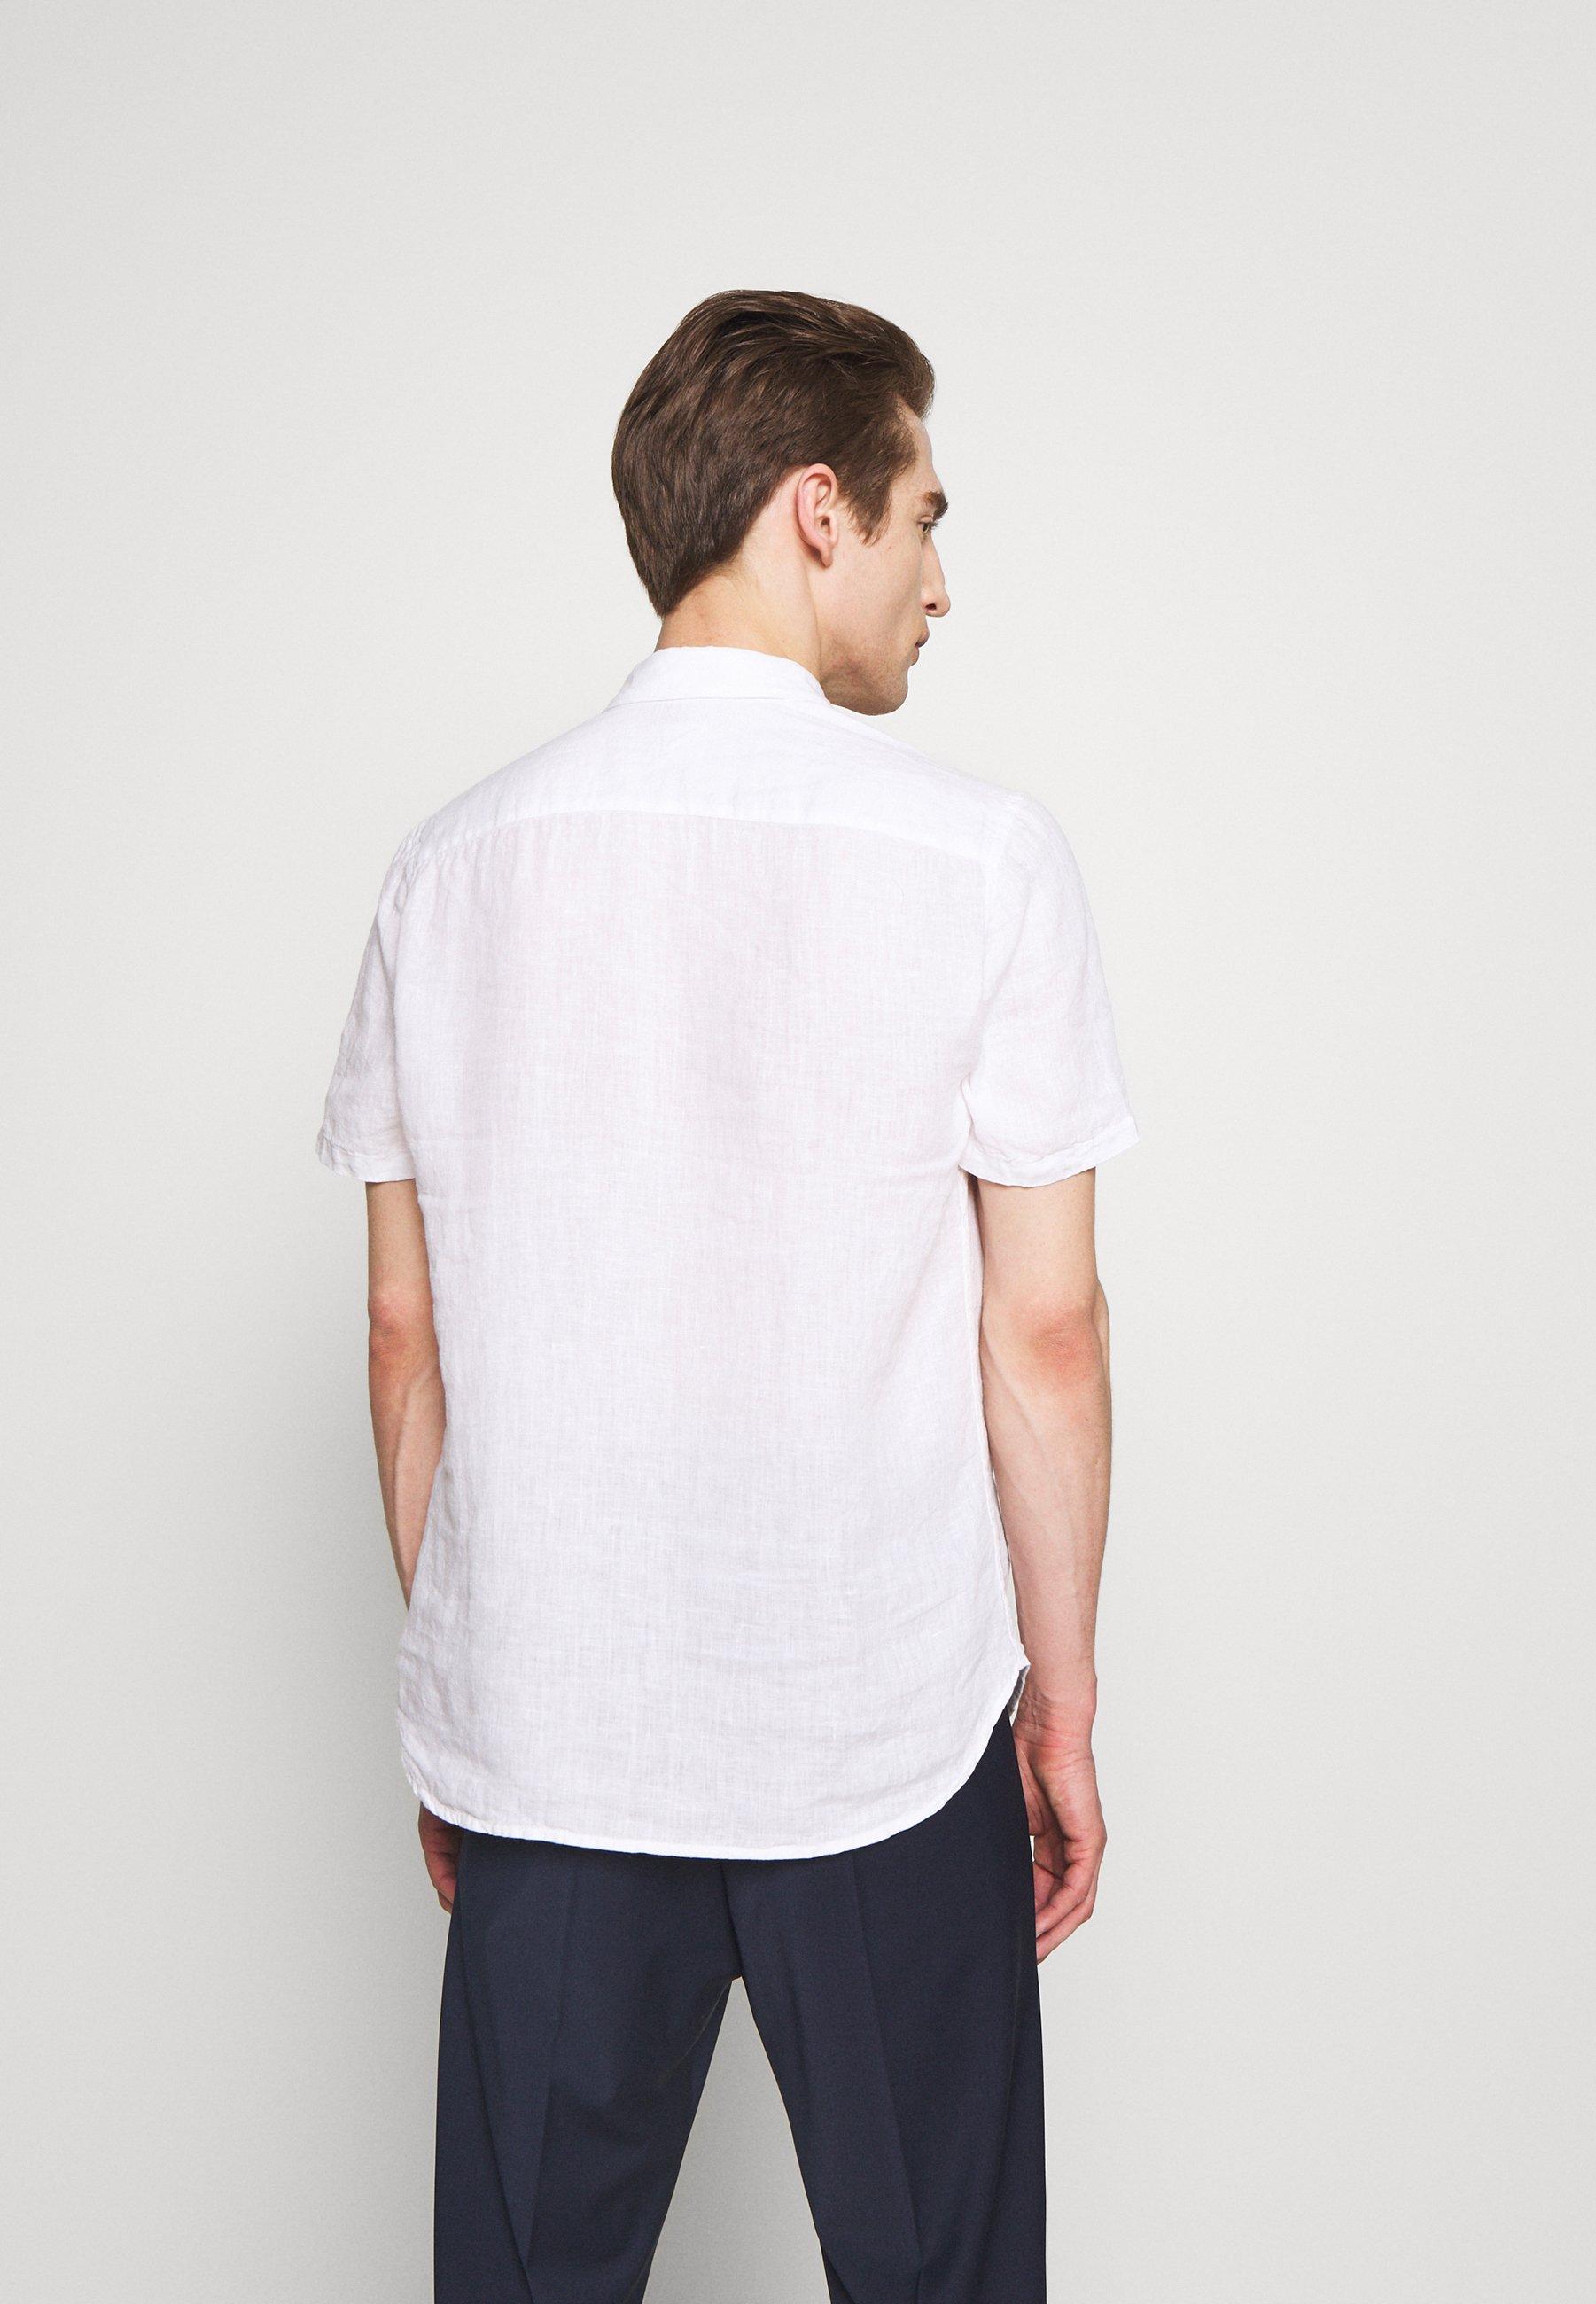 120% Lino Chemise - white